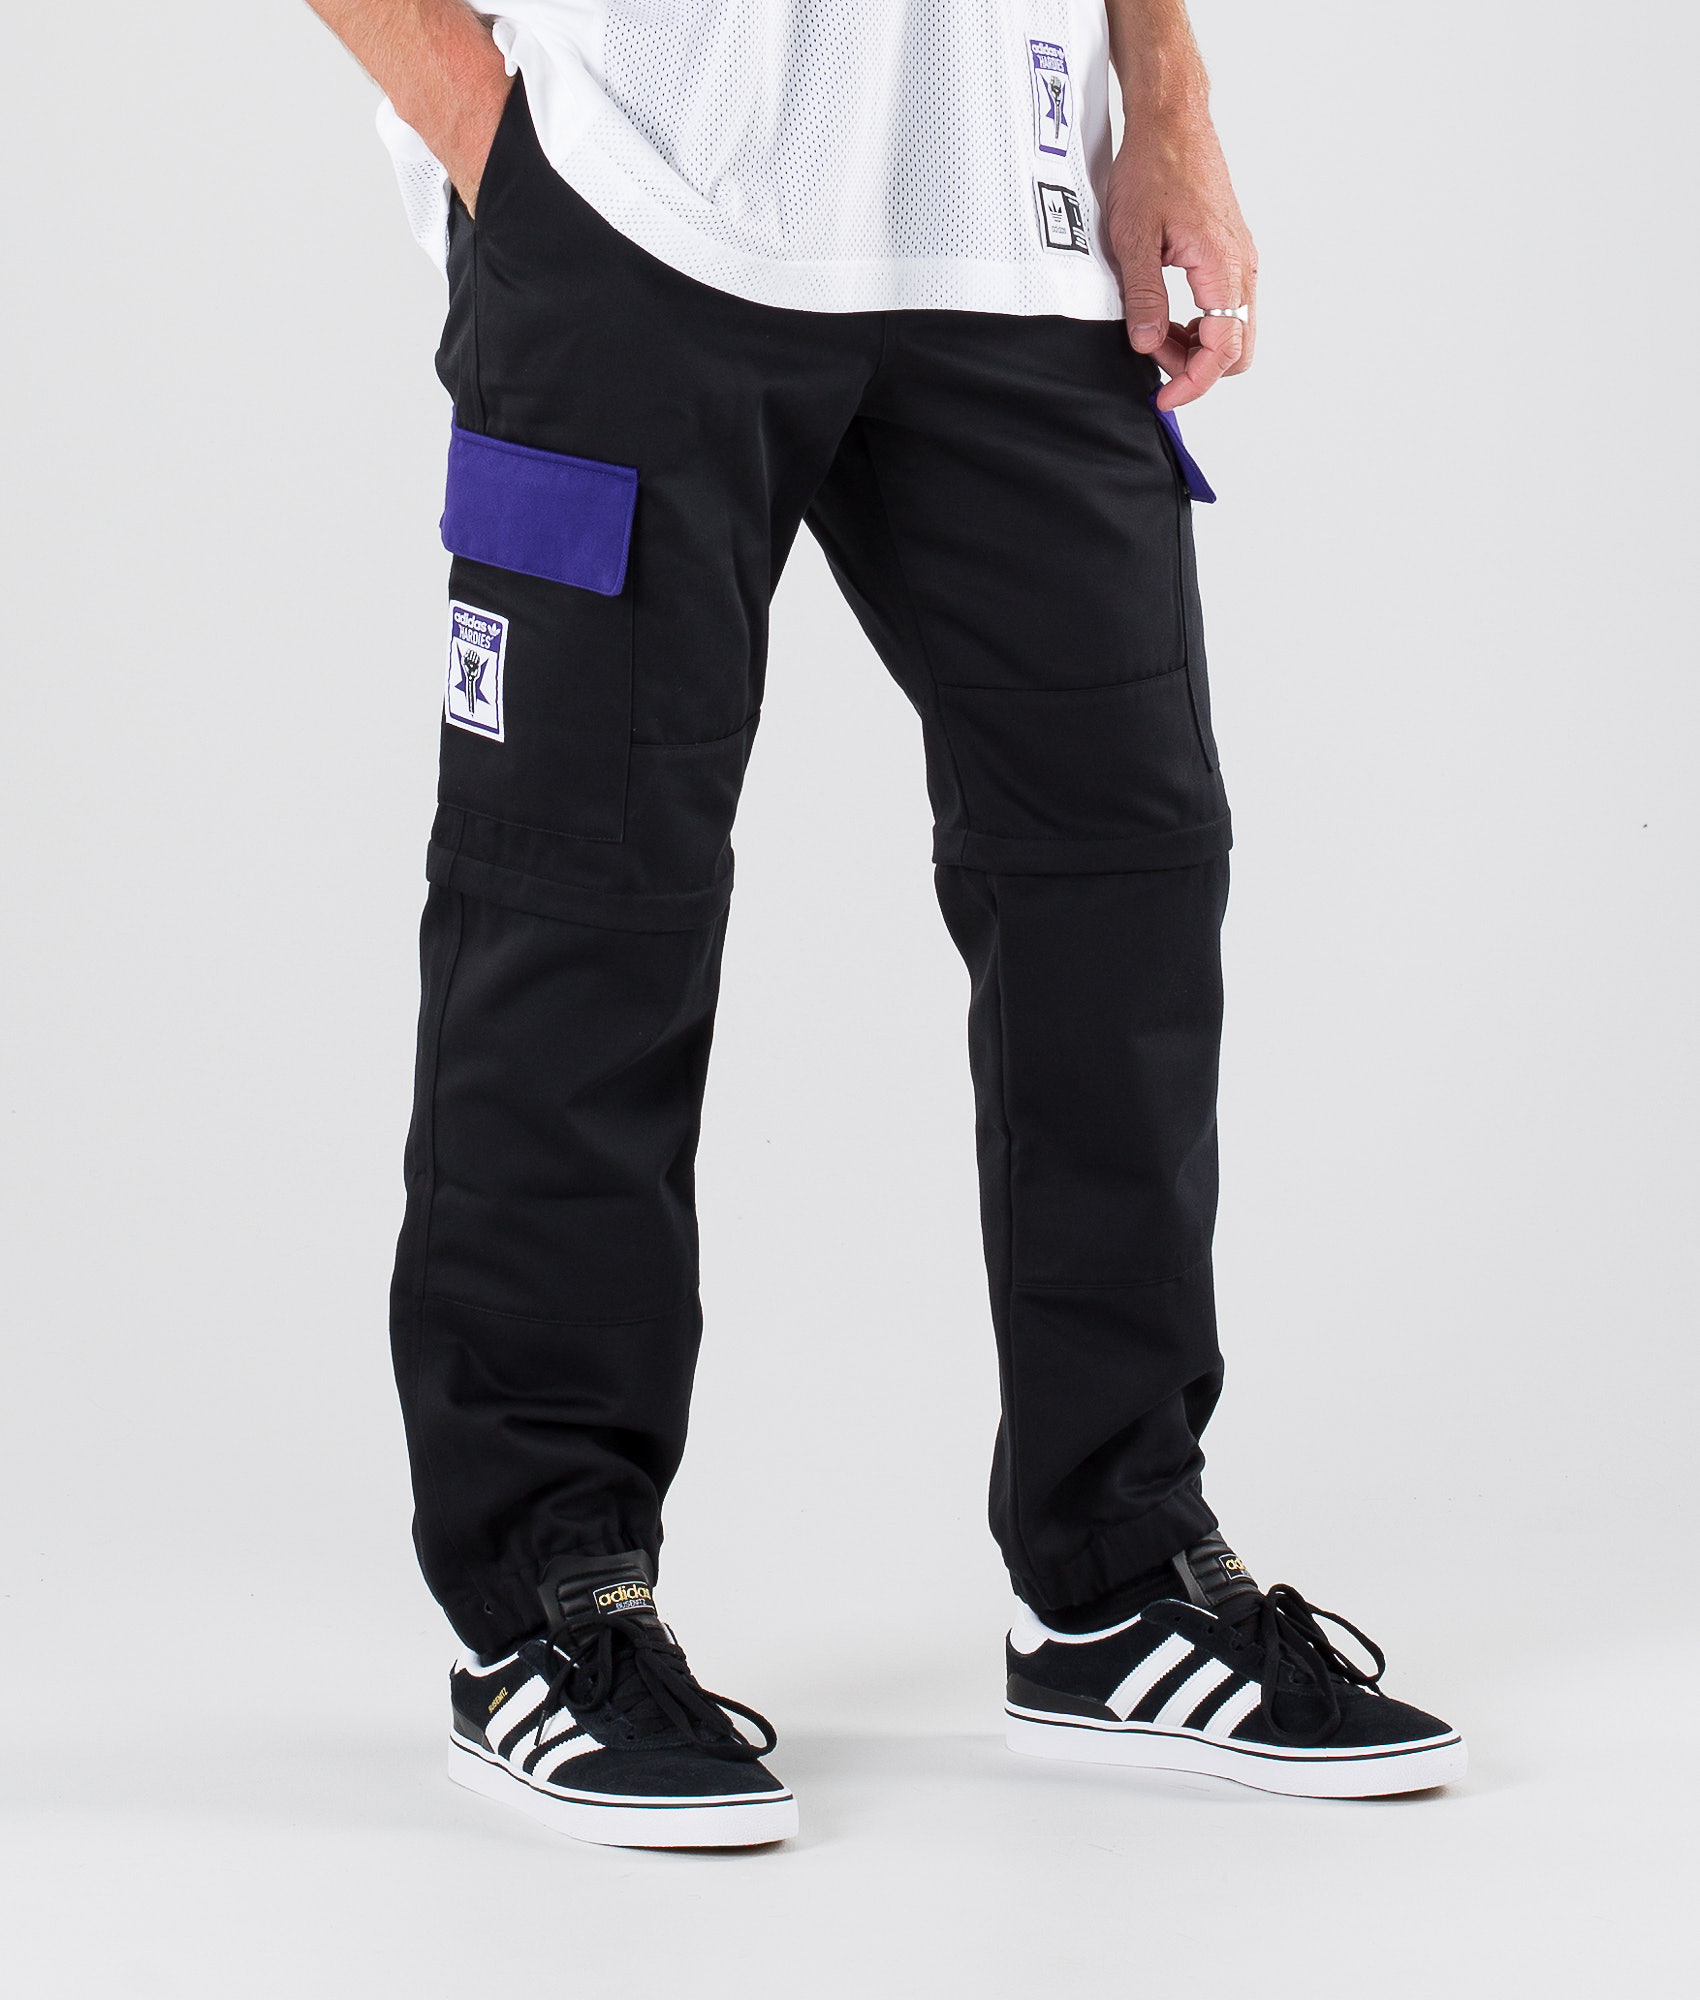 ac13fc1225a Heren Broeken & Jeans Streetwear | Gratis Bezorging | RIDESTORE